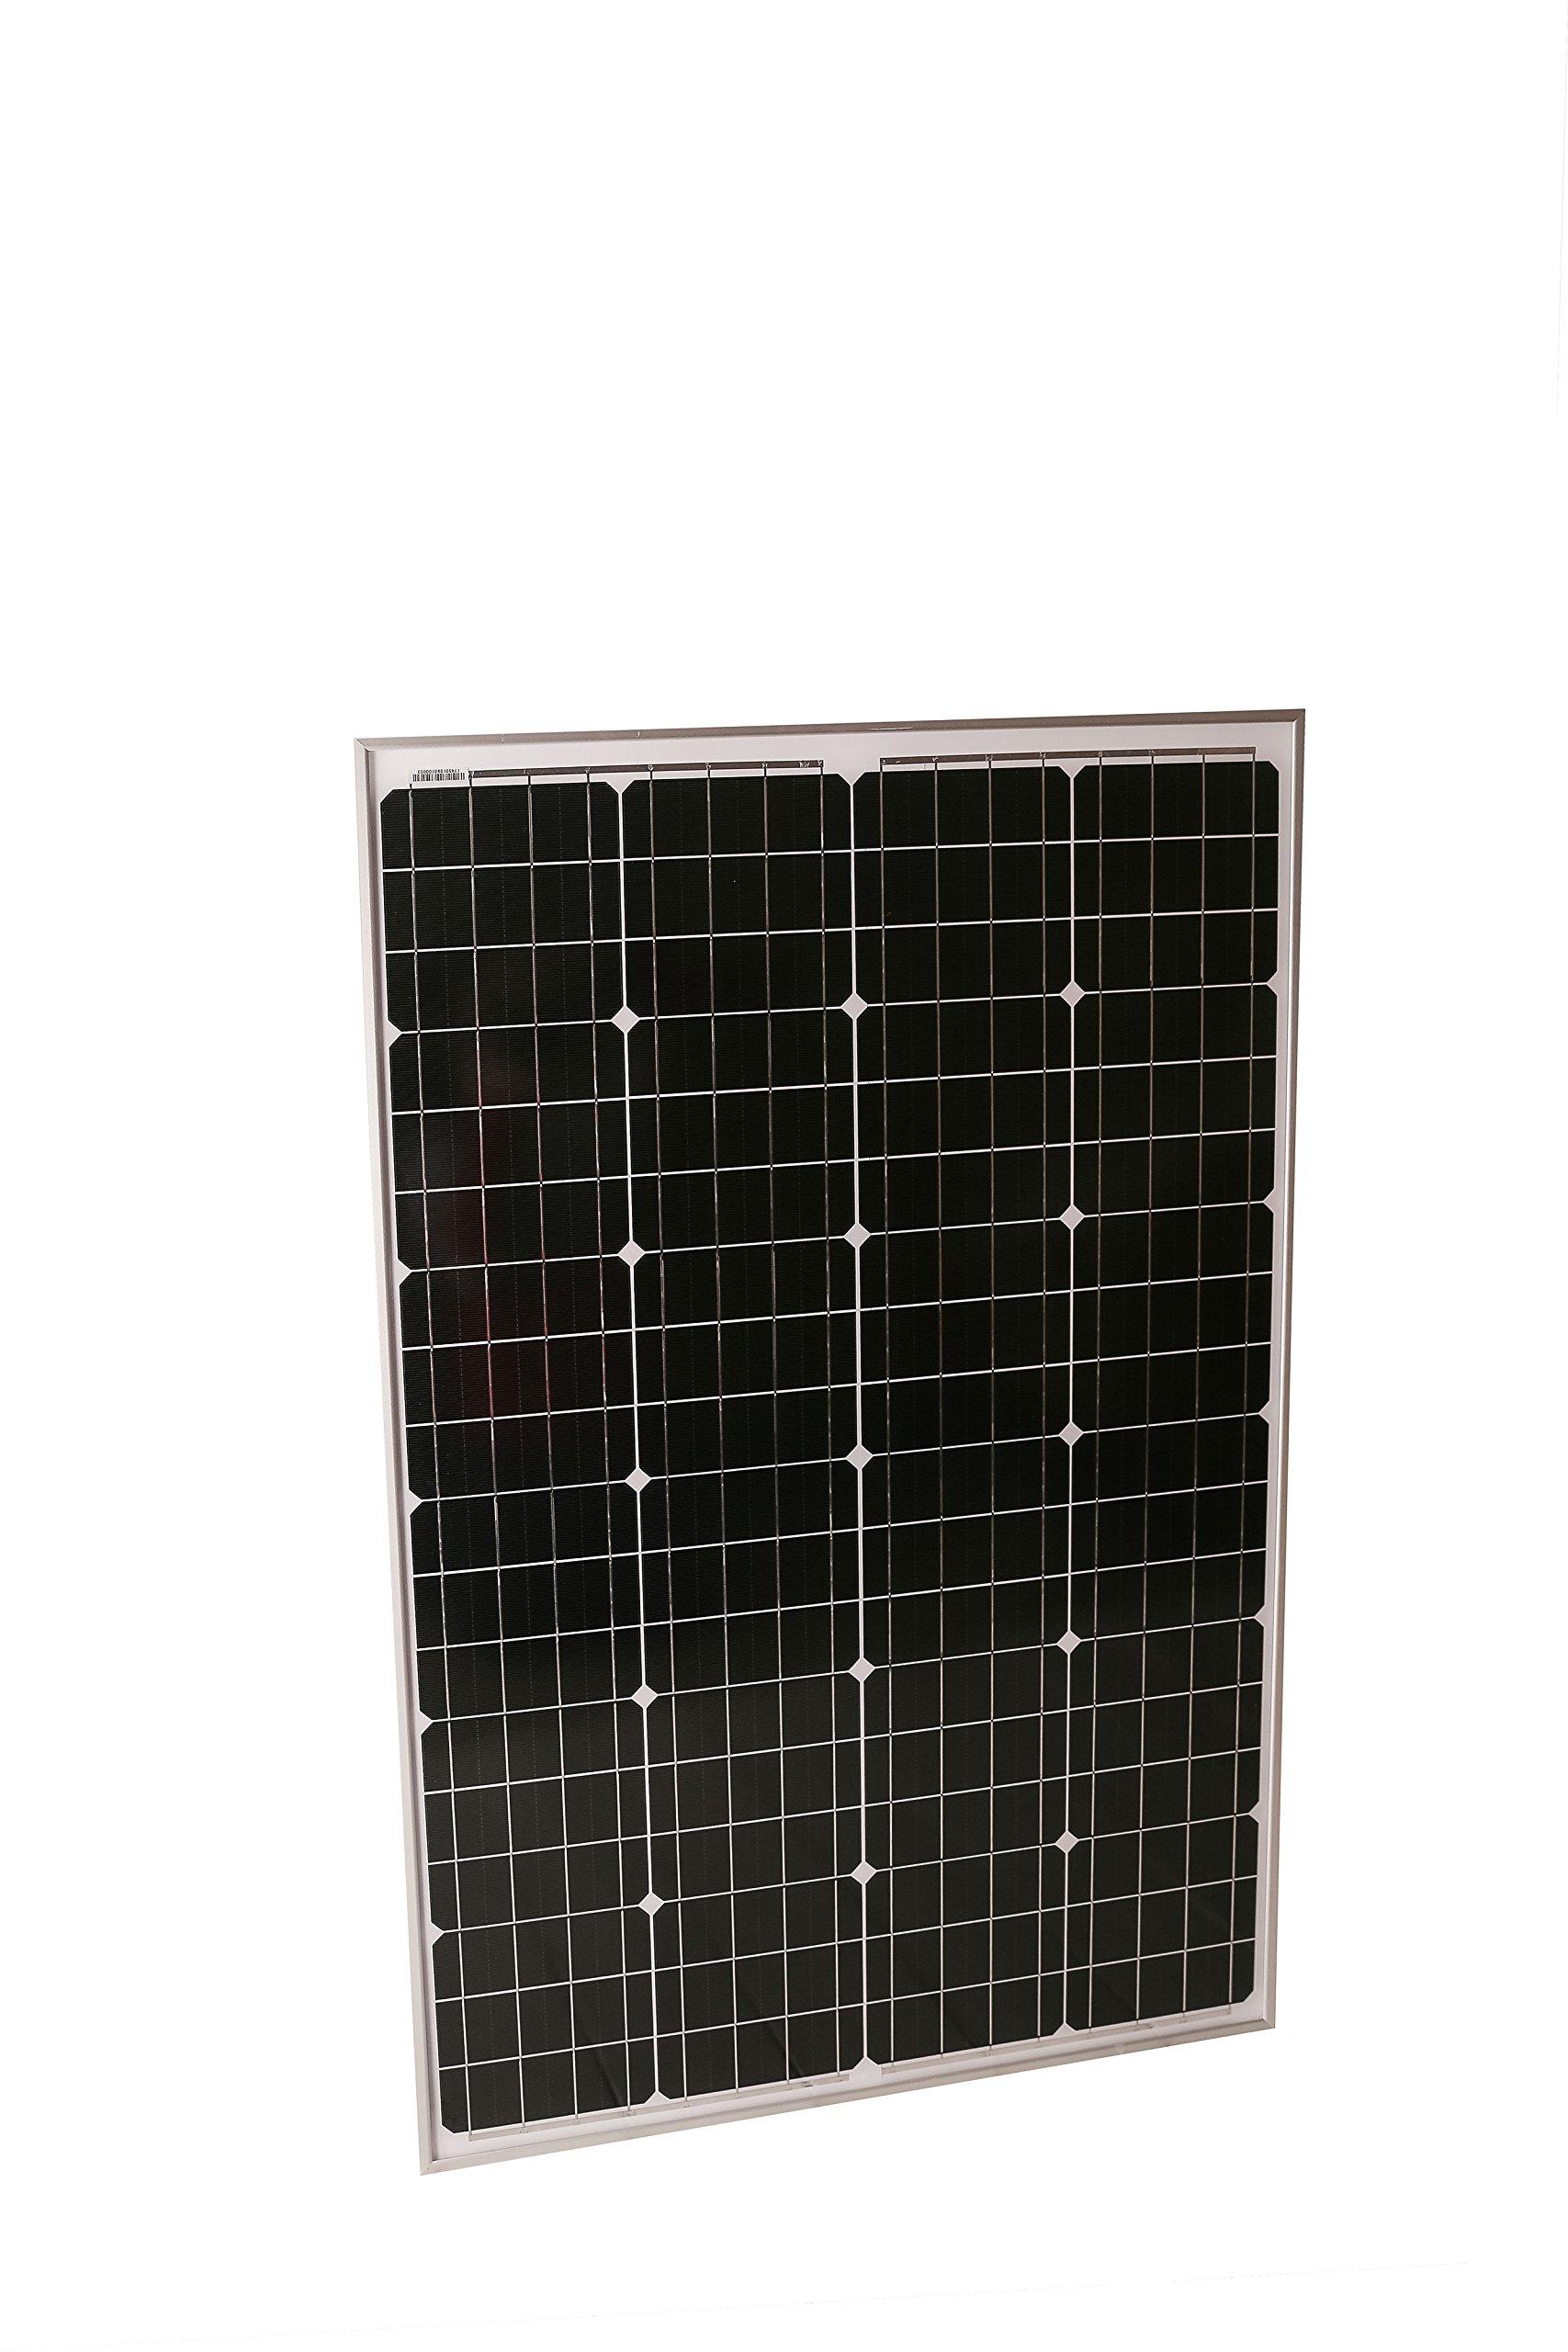 Solmida 100 Watt Monocrystalline Solar Panel | RV, Van, Camping, Boat, Prepper, Survival | Charge 12V Batteries, Outdoor High-Efficiency Energy | Snow, High Wind and Weather Resistant